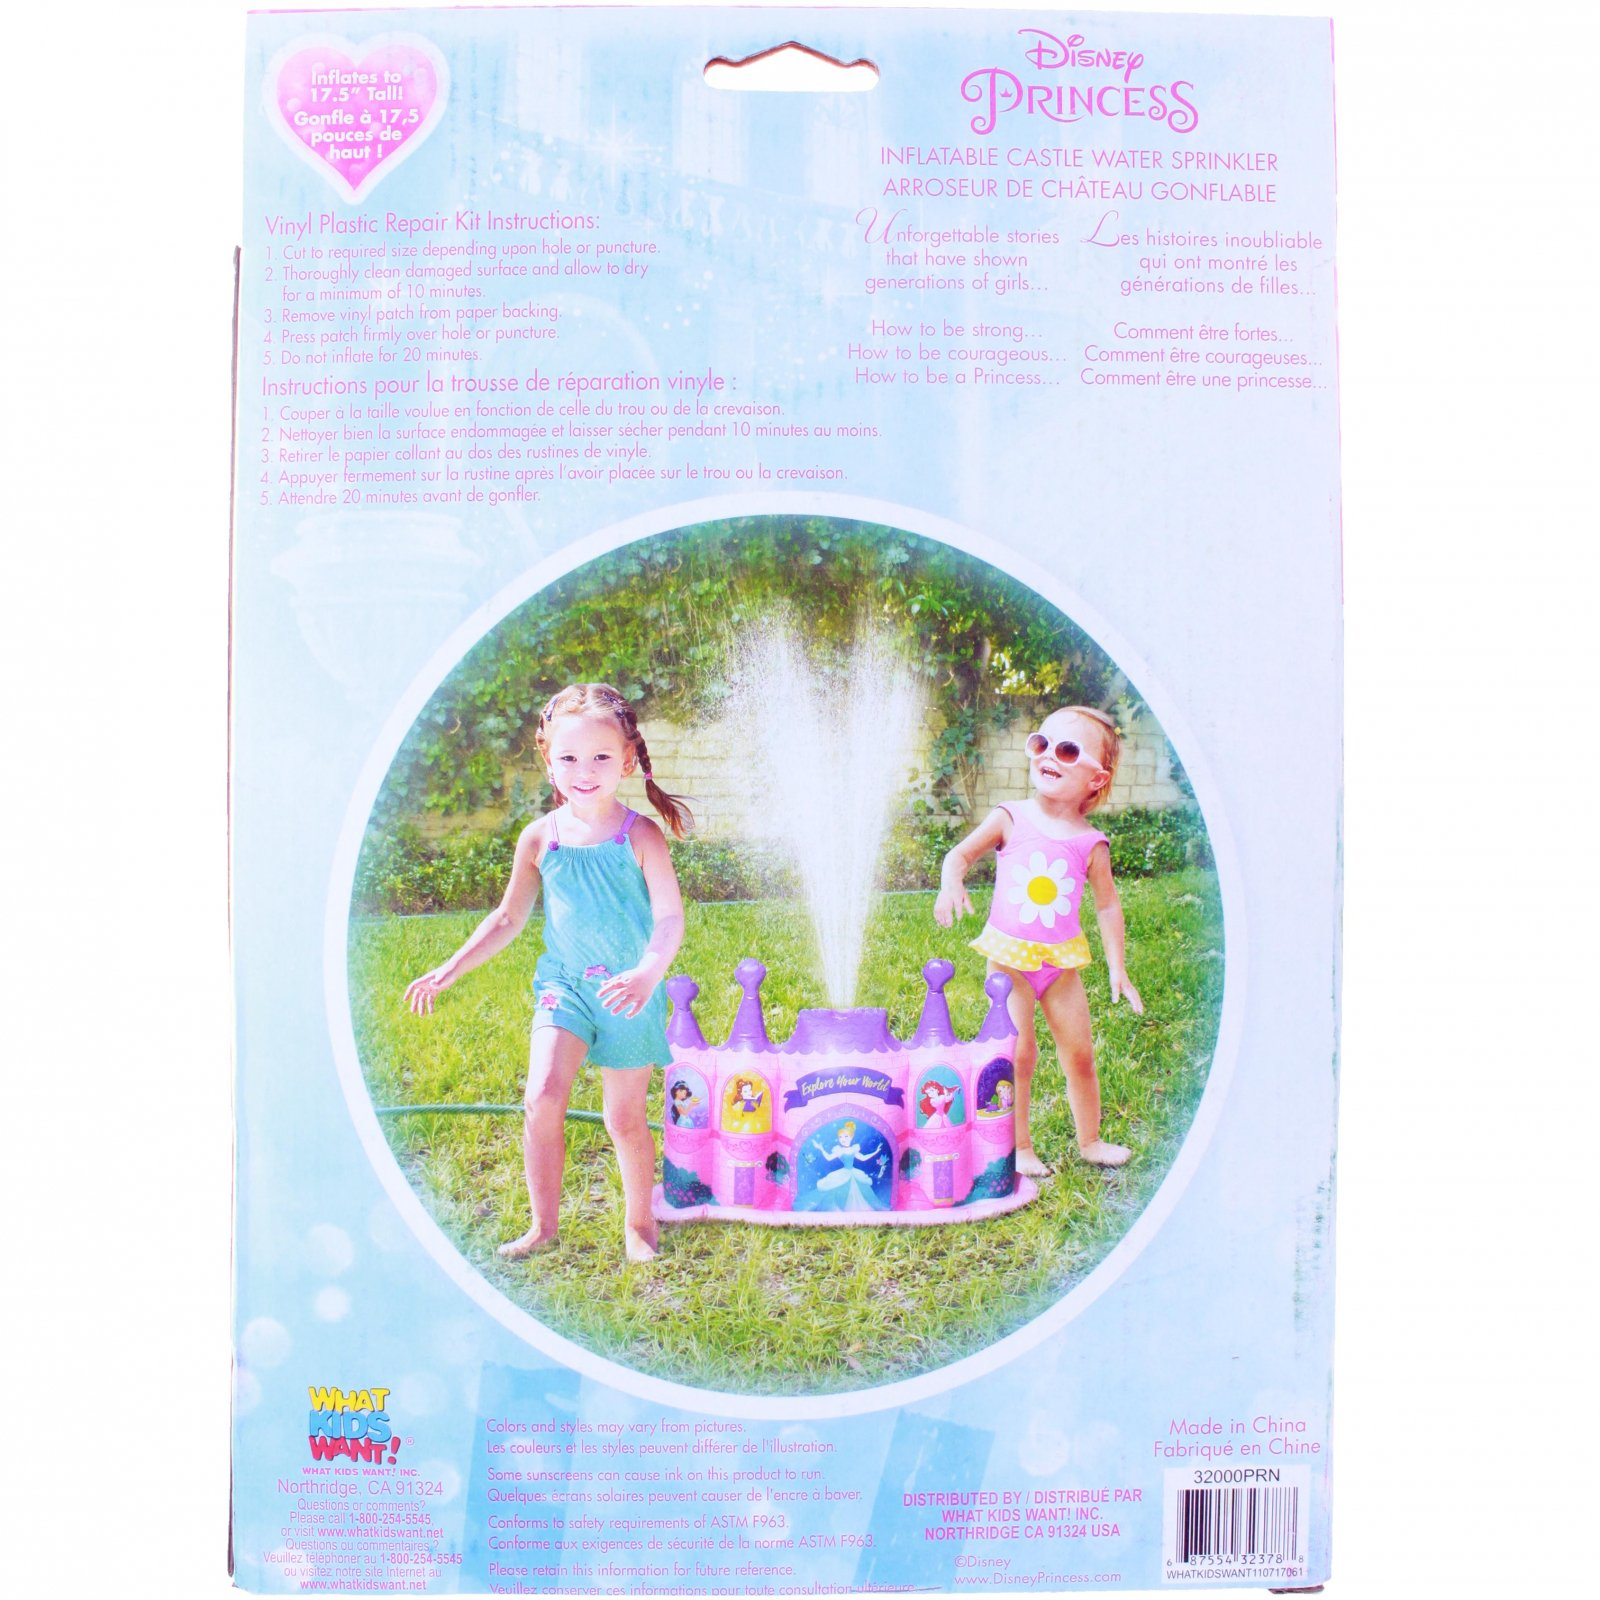 Disney Princess Inflatable Water Sprinkler Castle